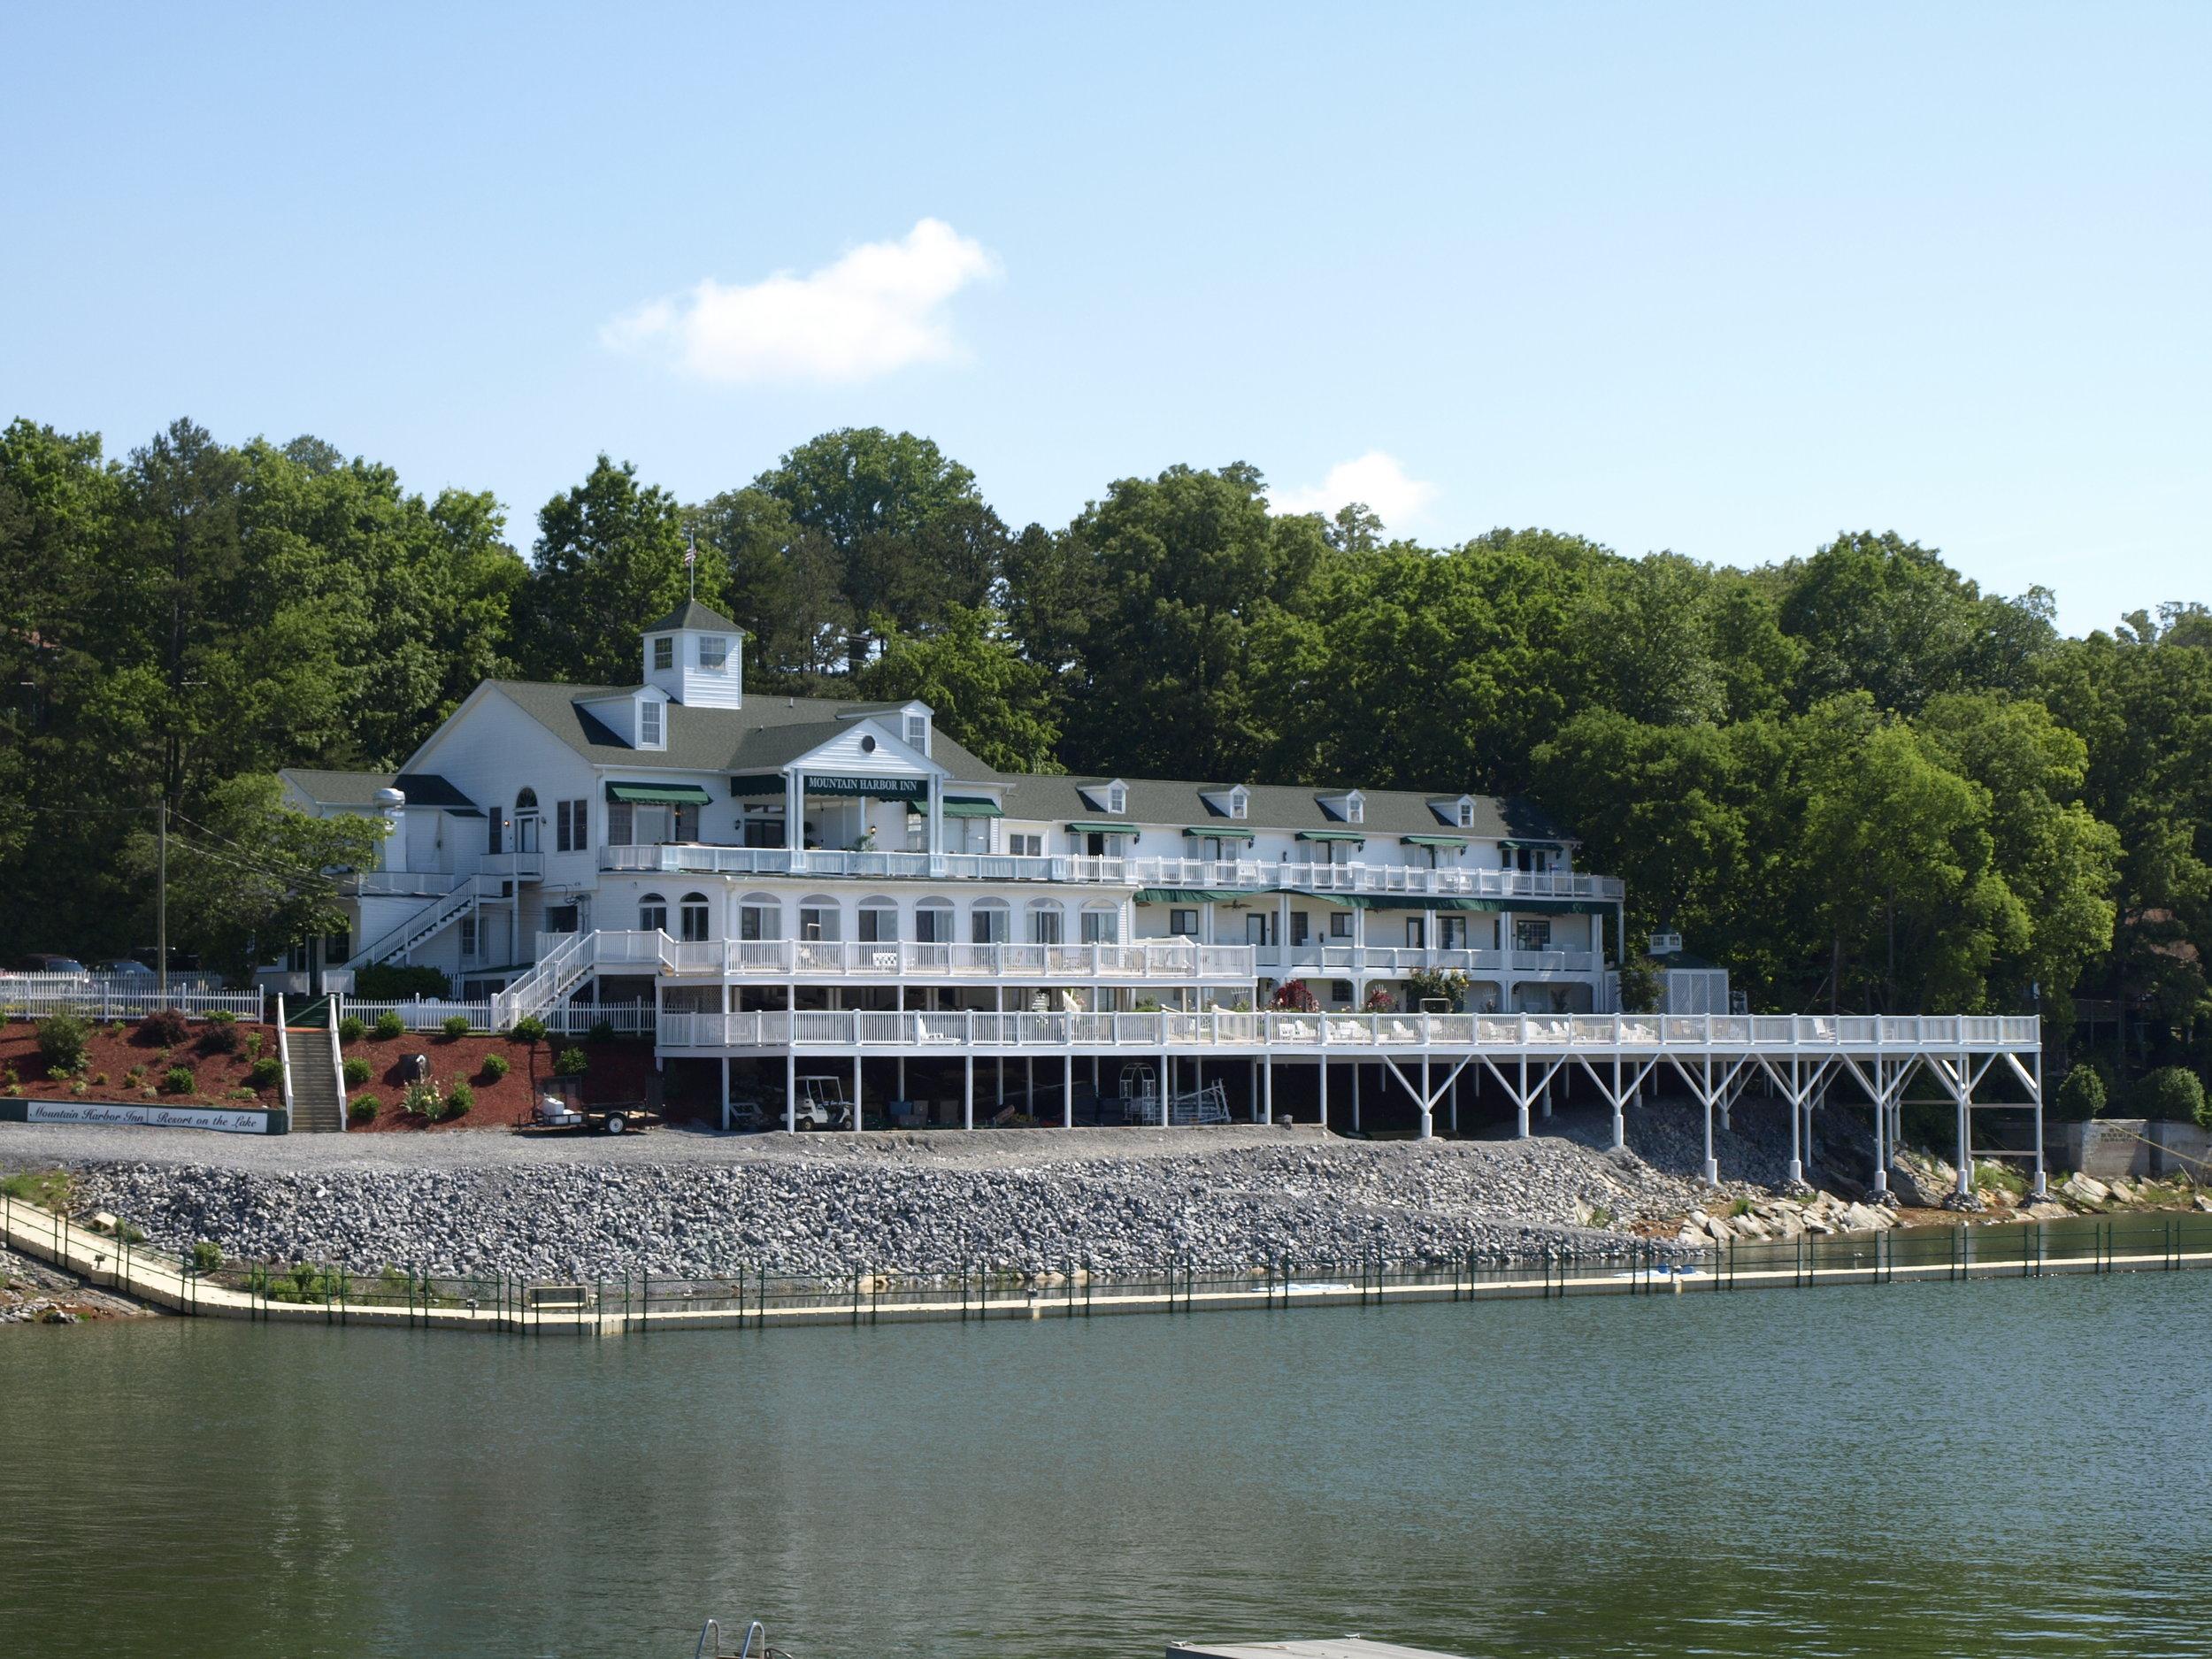 Mountain Harbor Inn   1199 Hwy. 139 Dandridge, TN 37725 (865) 397-1313